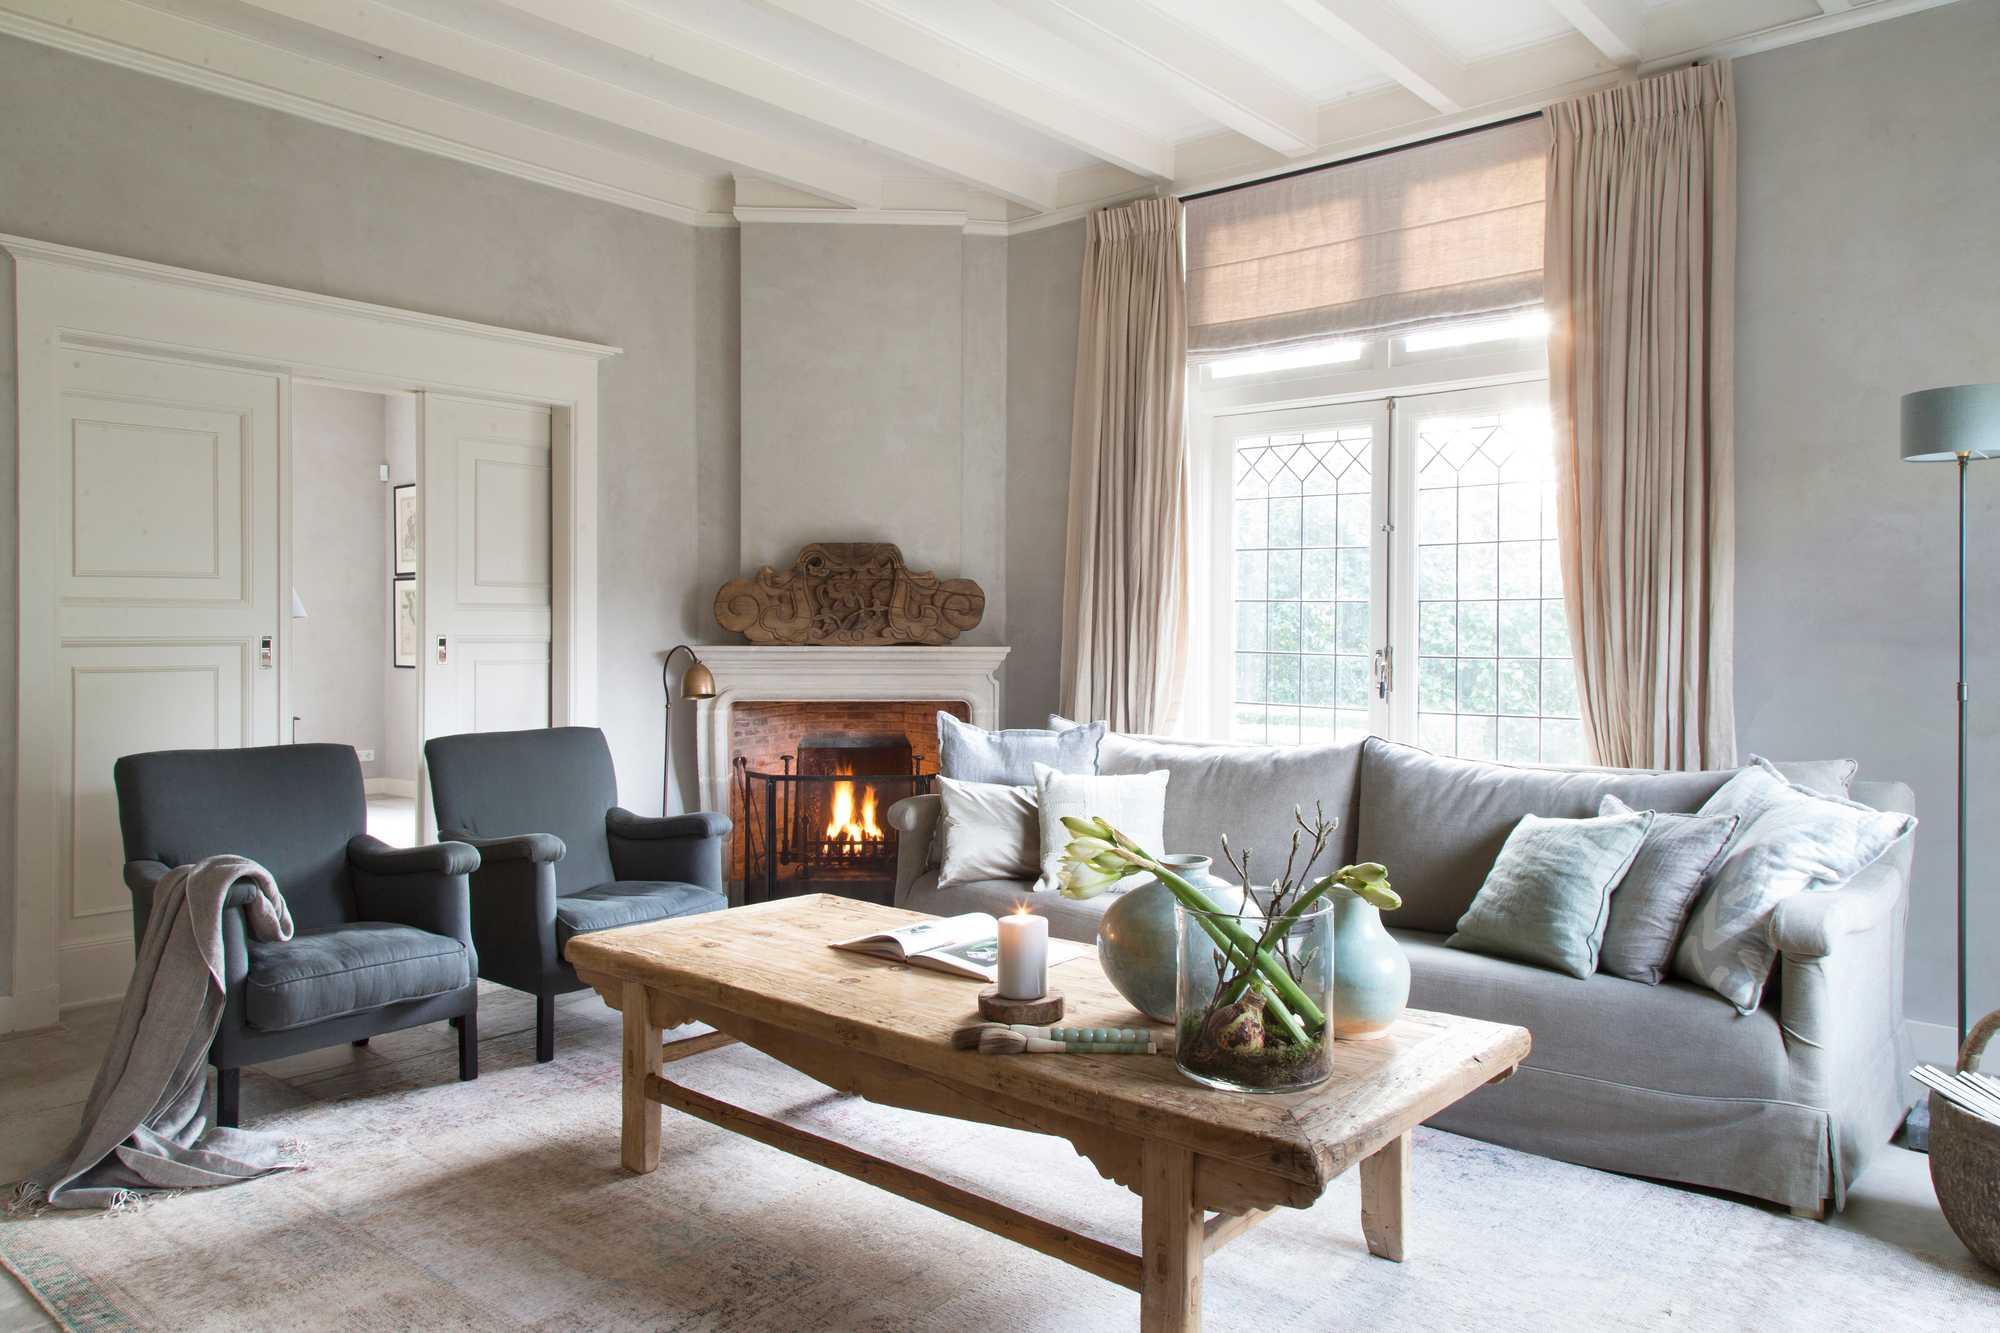 schouw woonkamer wytske stylexclusief ornament